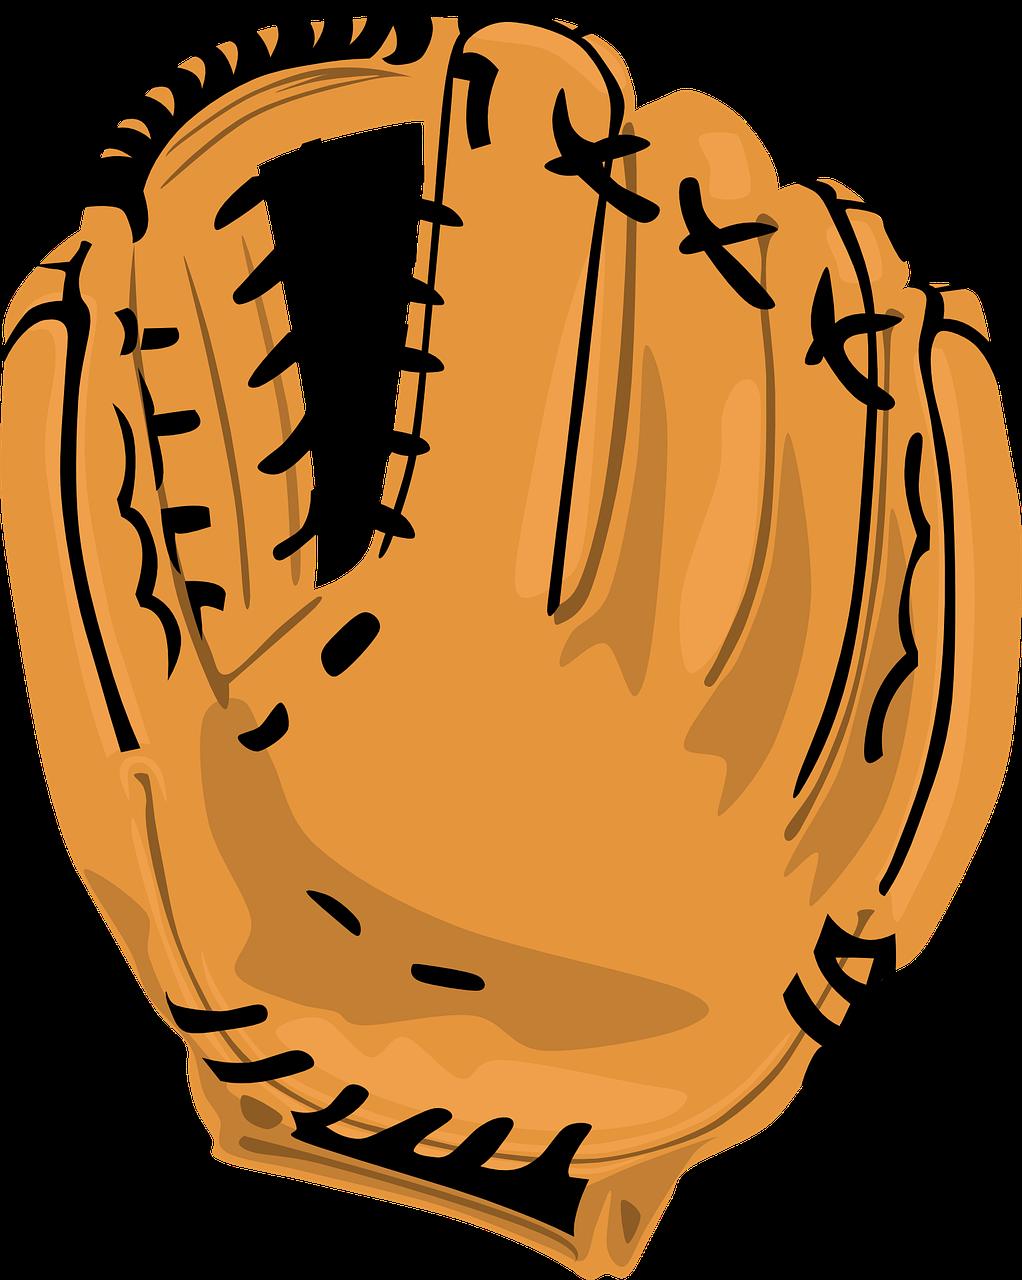 Glove clipart gants. Baseball mitt leather transparent